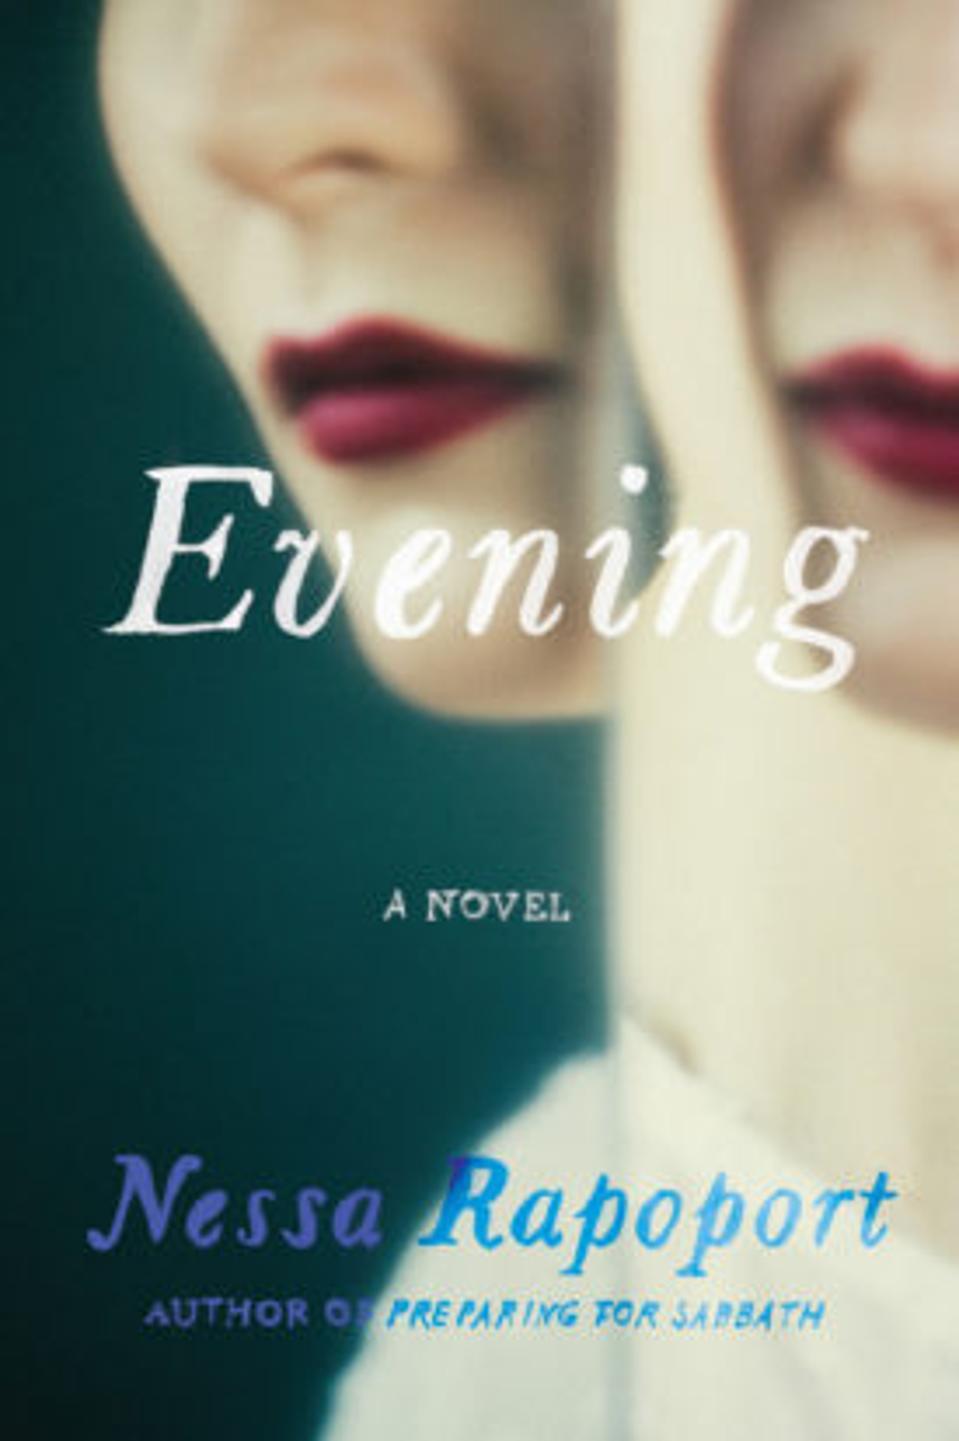 Nessa Rapoport's new novel